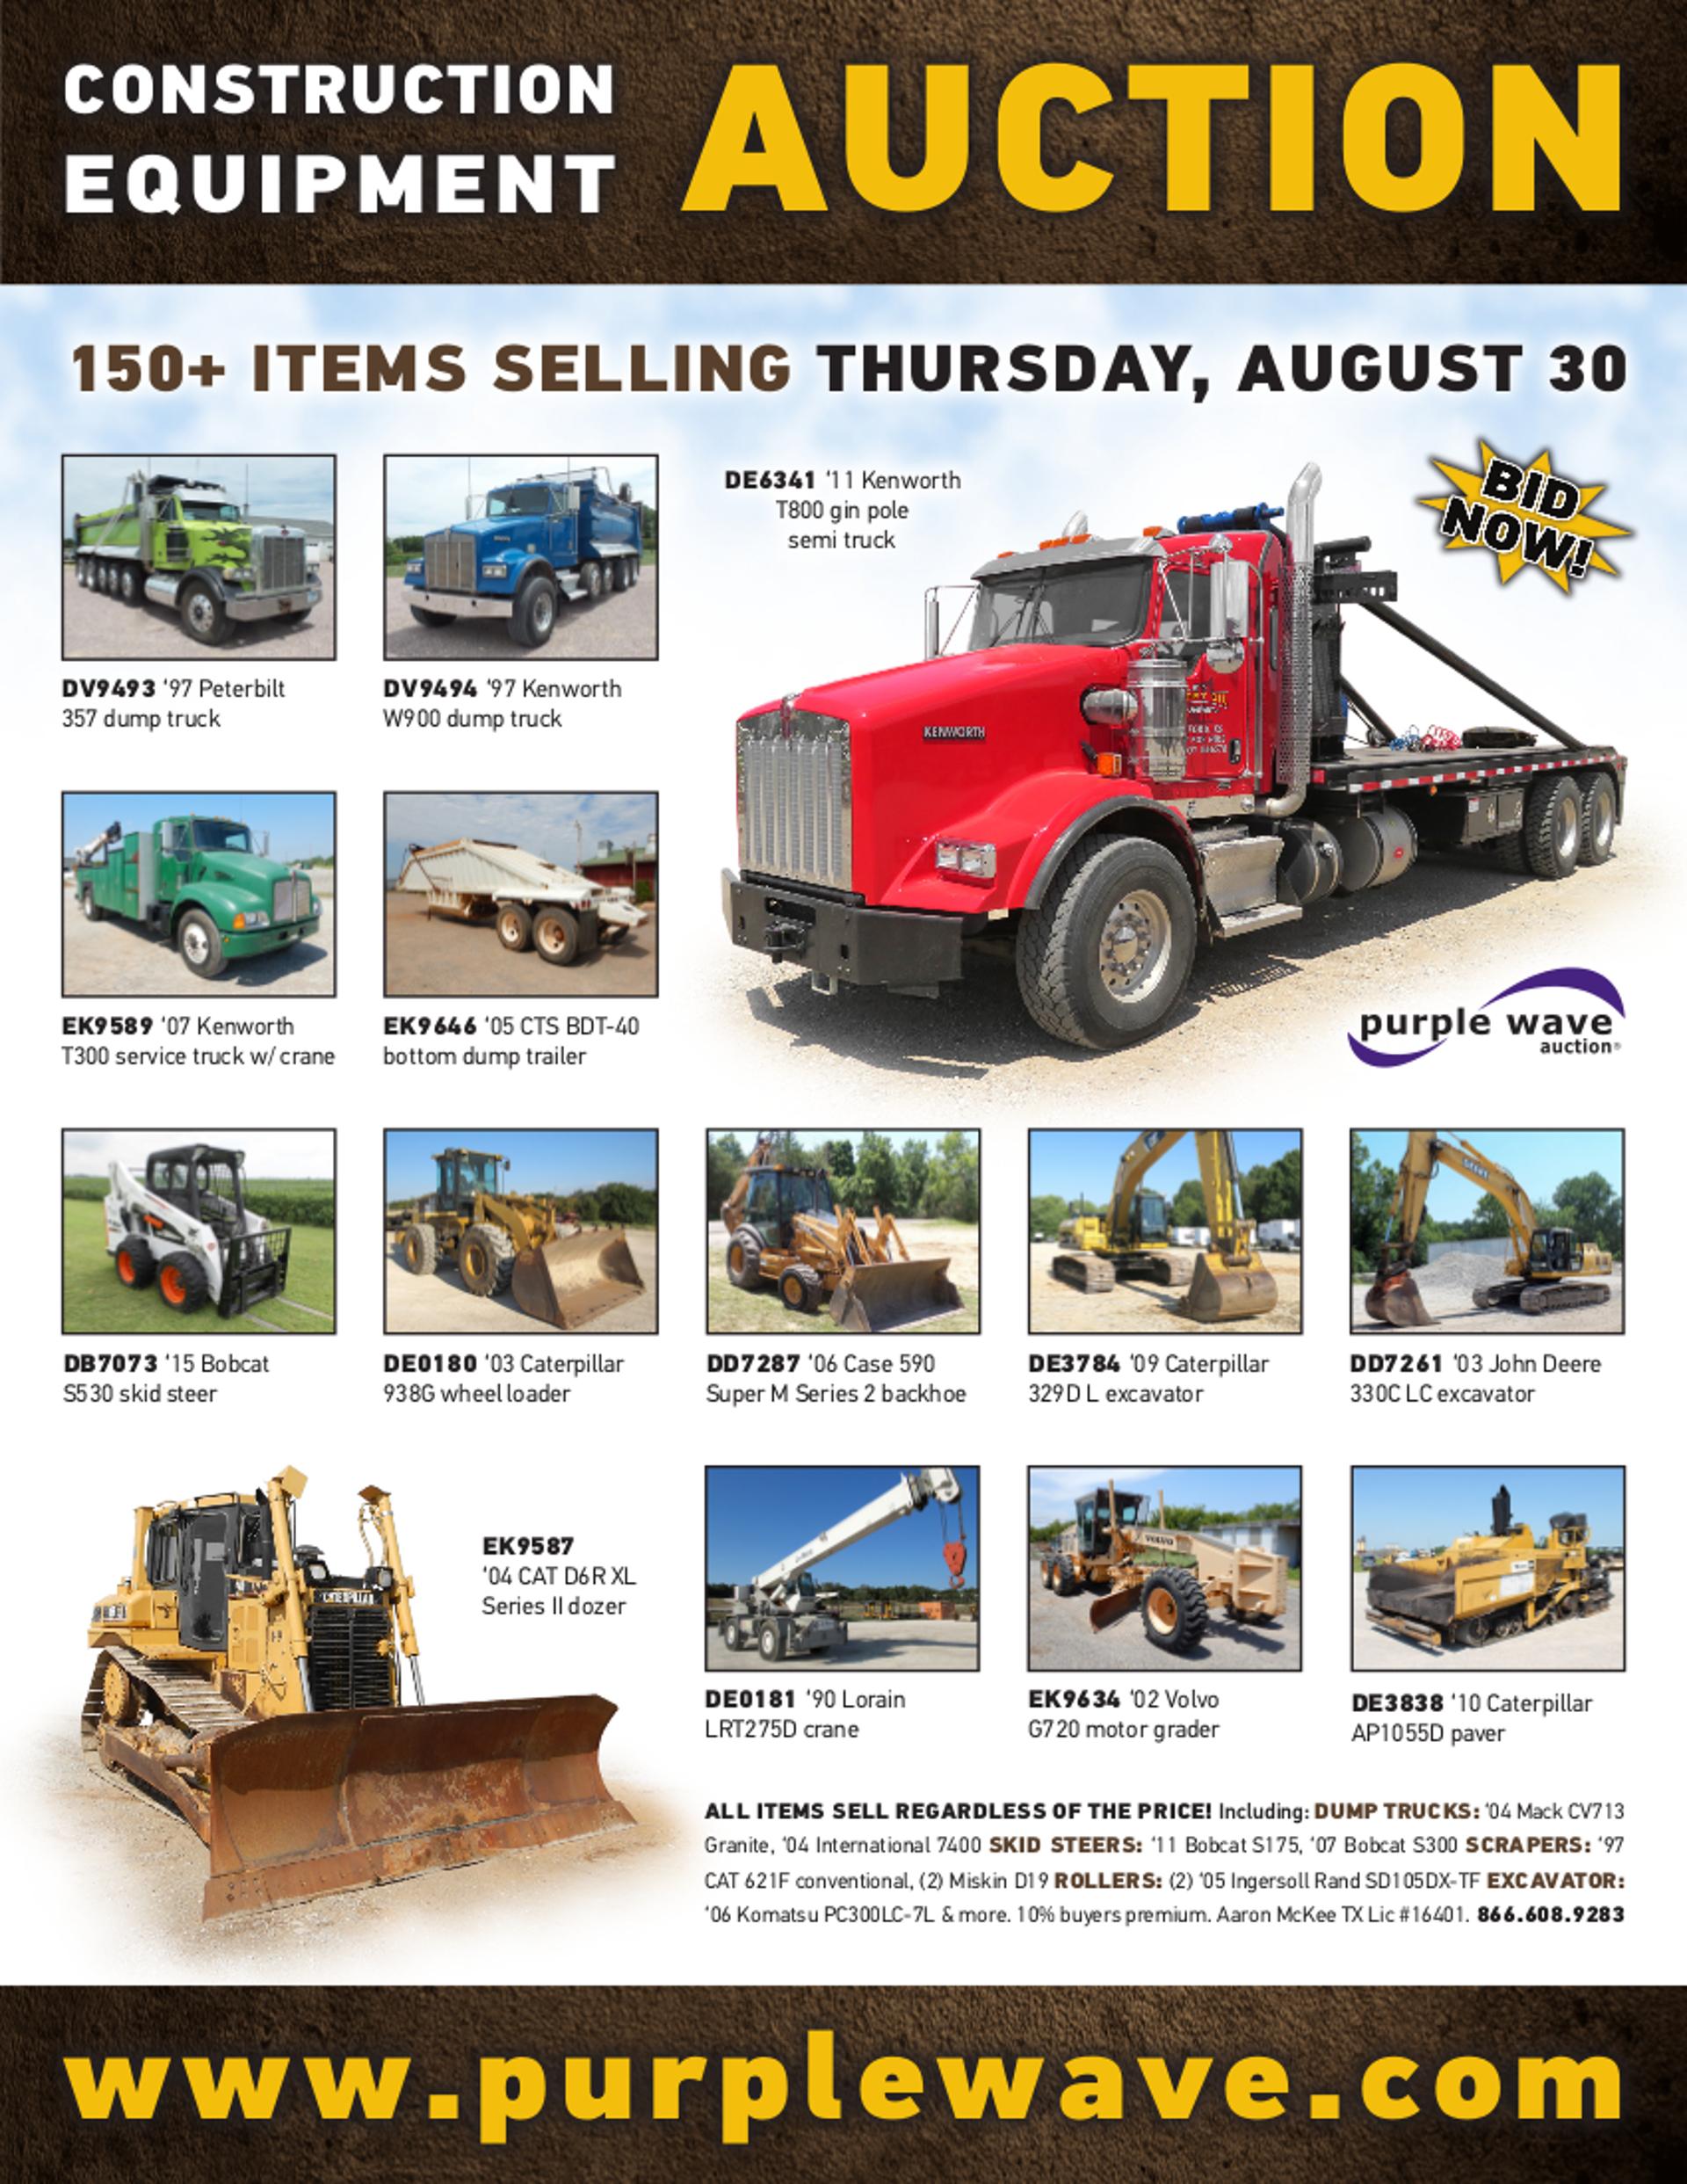 SOLD! August 30 Construction Equipment Auction | PurpleWave